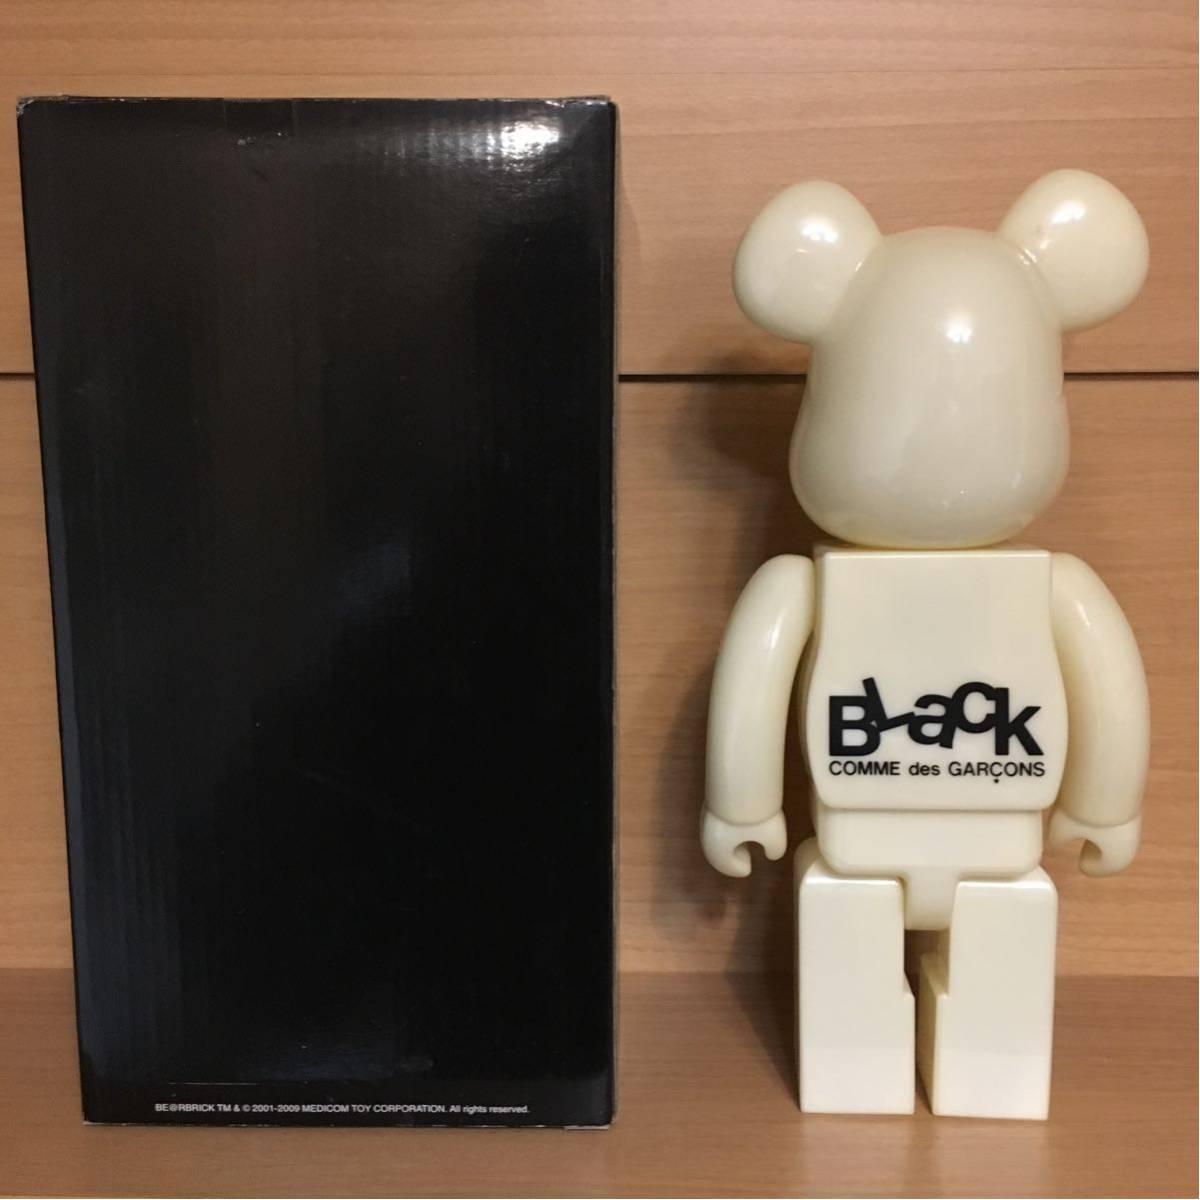 BE@RBRICK BLACK COMME des GARCONS 400% ベアブリック ブラック コムデギャルソン medicomtoy メディコムトイ be@rbrick/kaws hf fragment_画像2